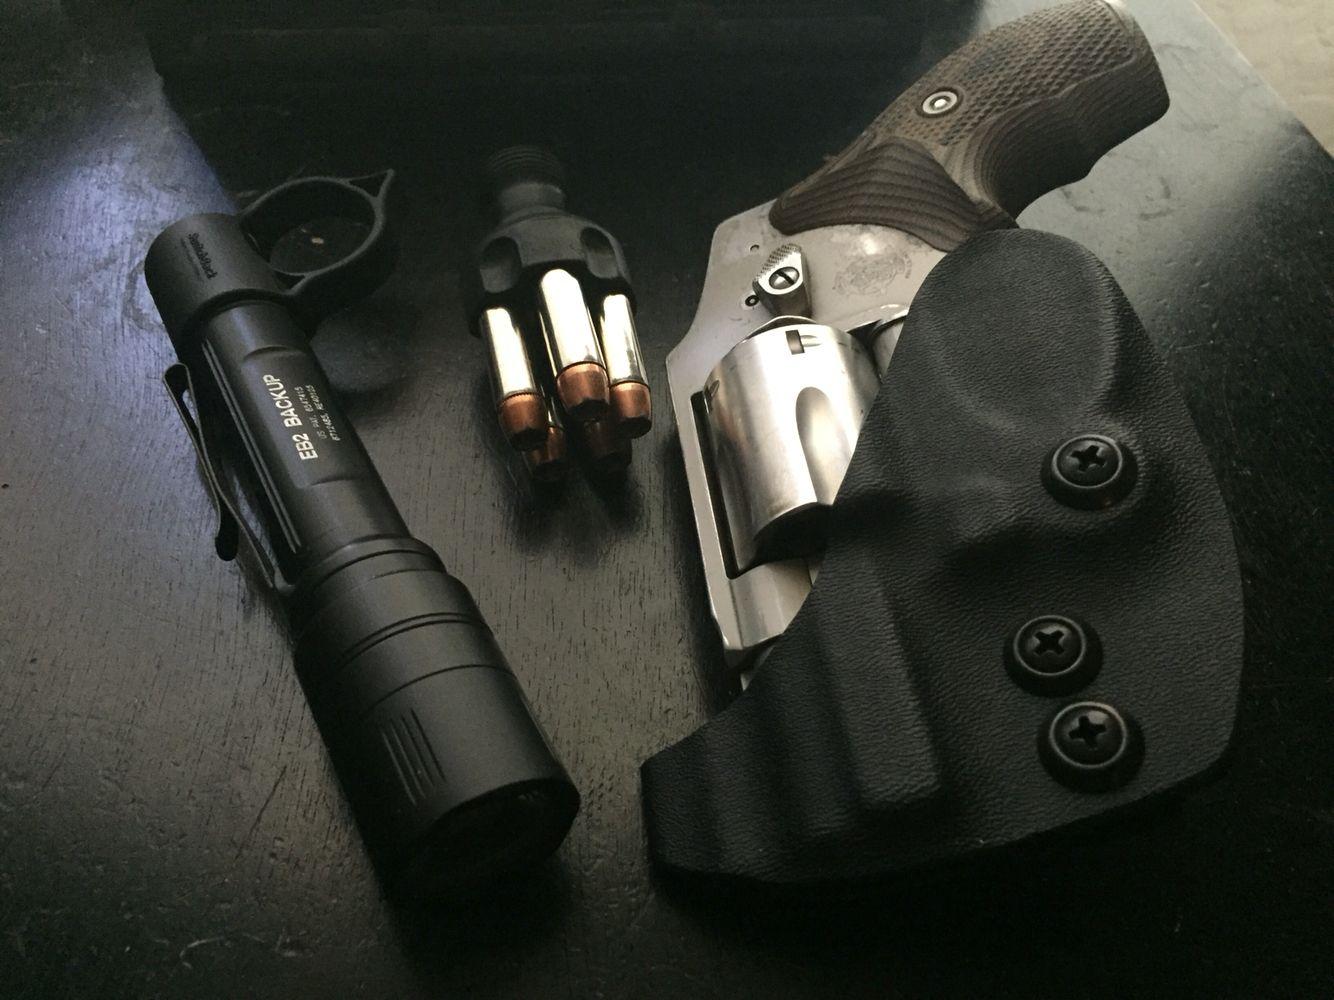 Smith & Wesson J frame IWB minimalist kydex holster | RedHawk